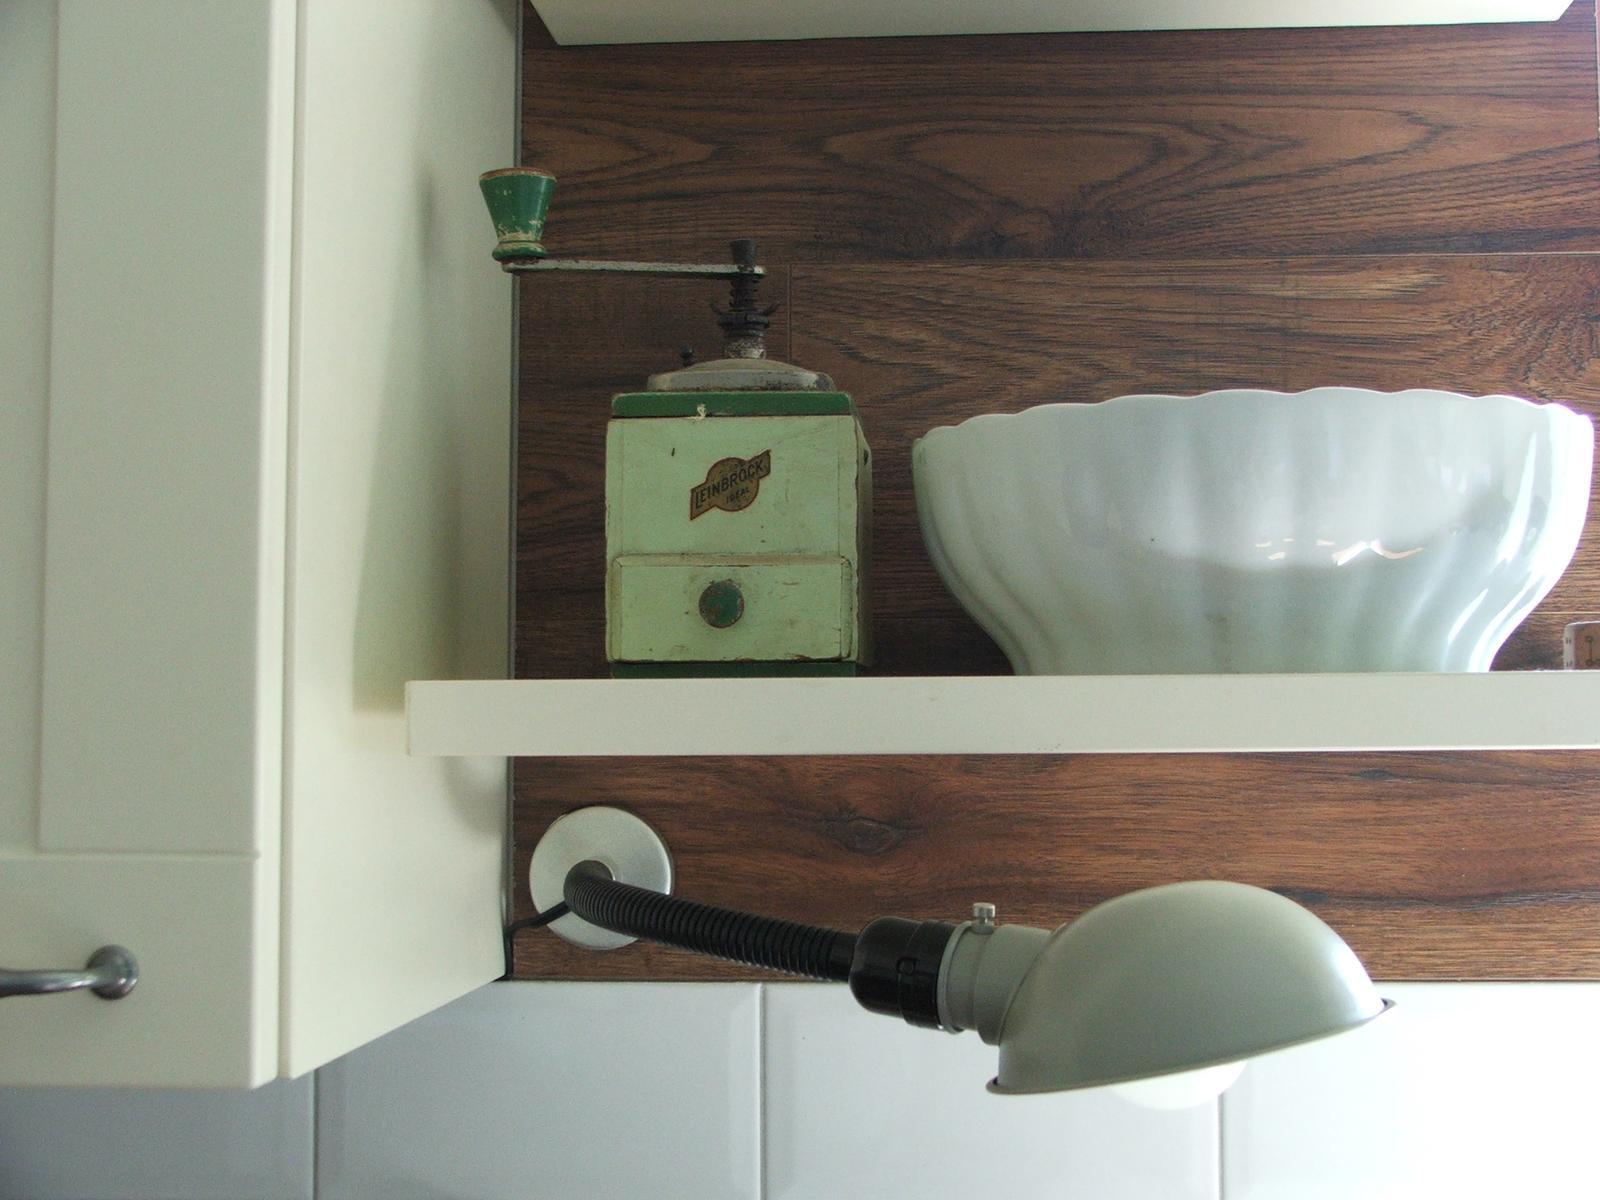 Domov - a taká istá lampa do kuchyne....